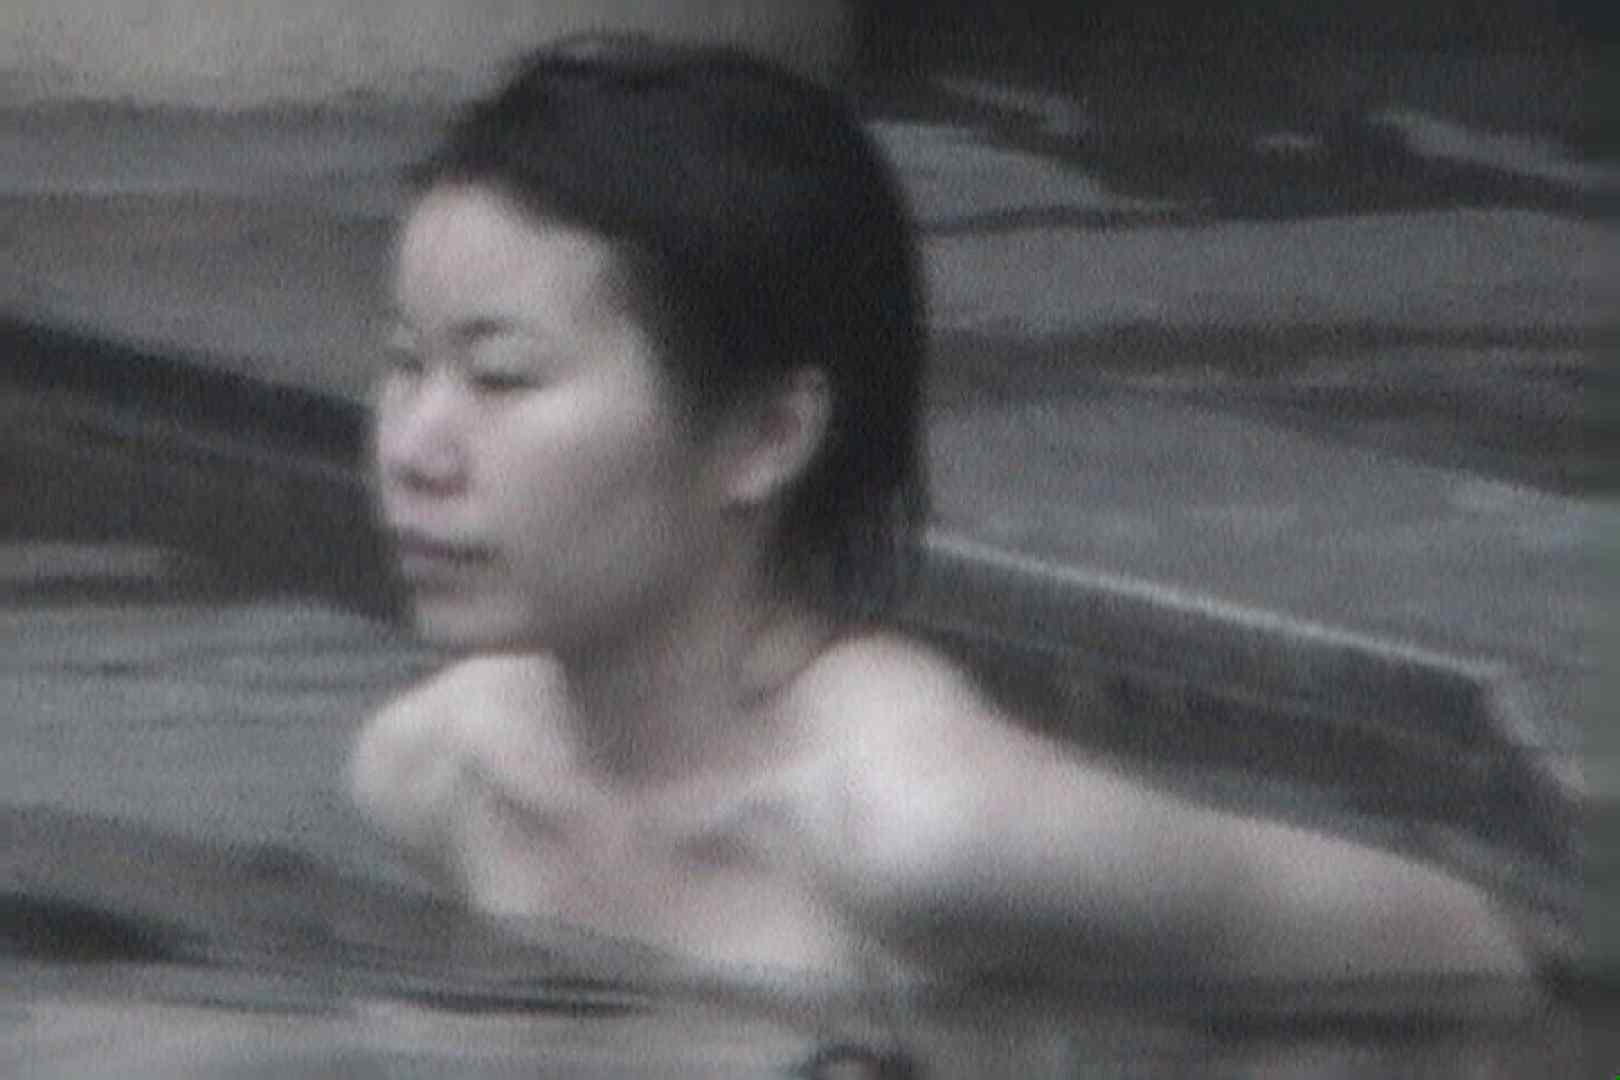 Aquaな露天風呂Vol.556 露天風呂編 | 盗撮シリーズ  99PIX 81